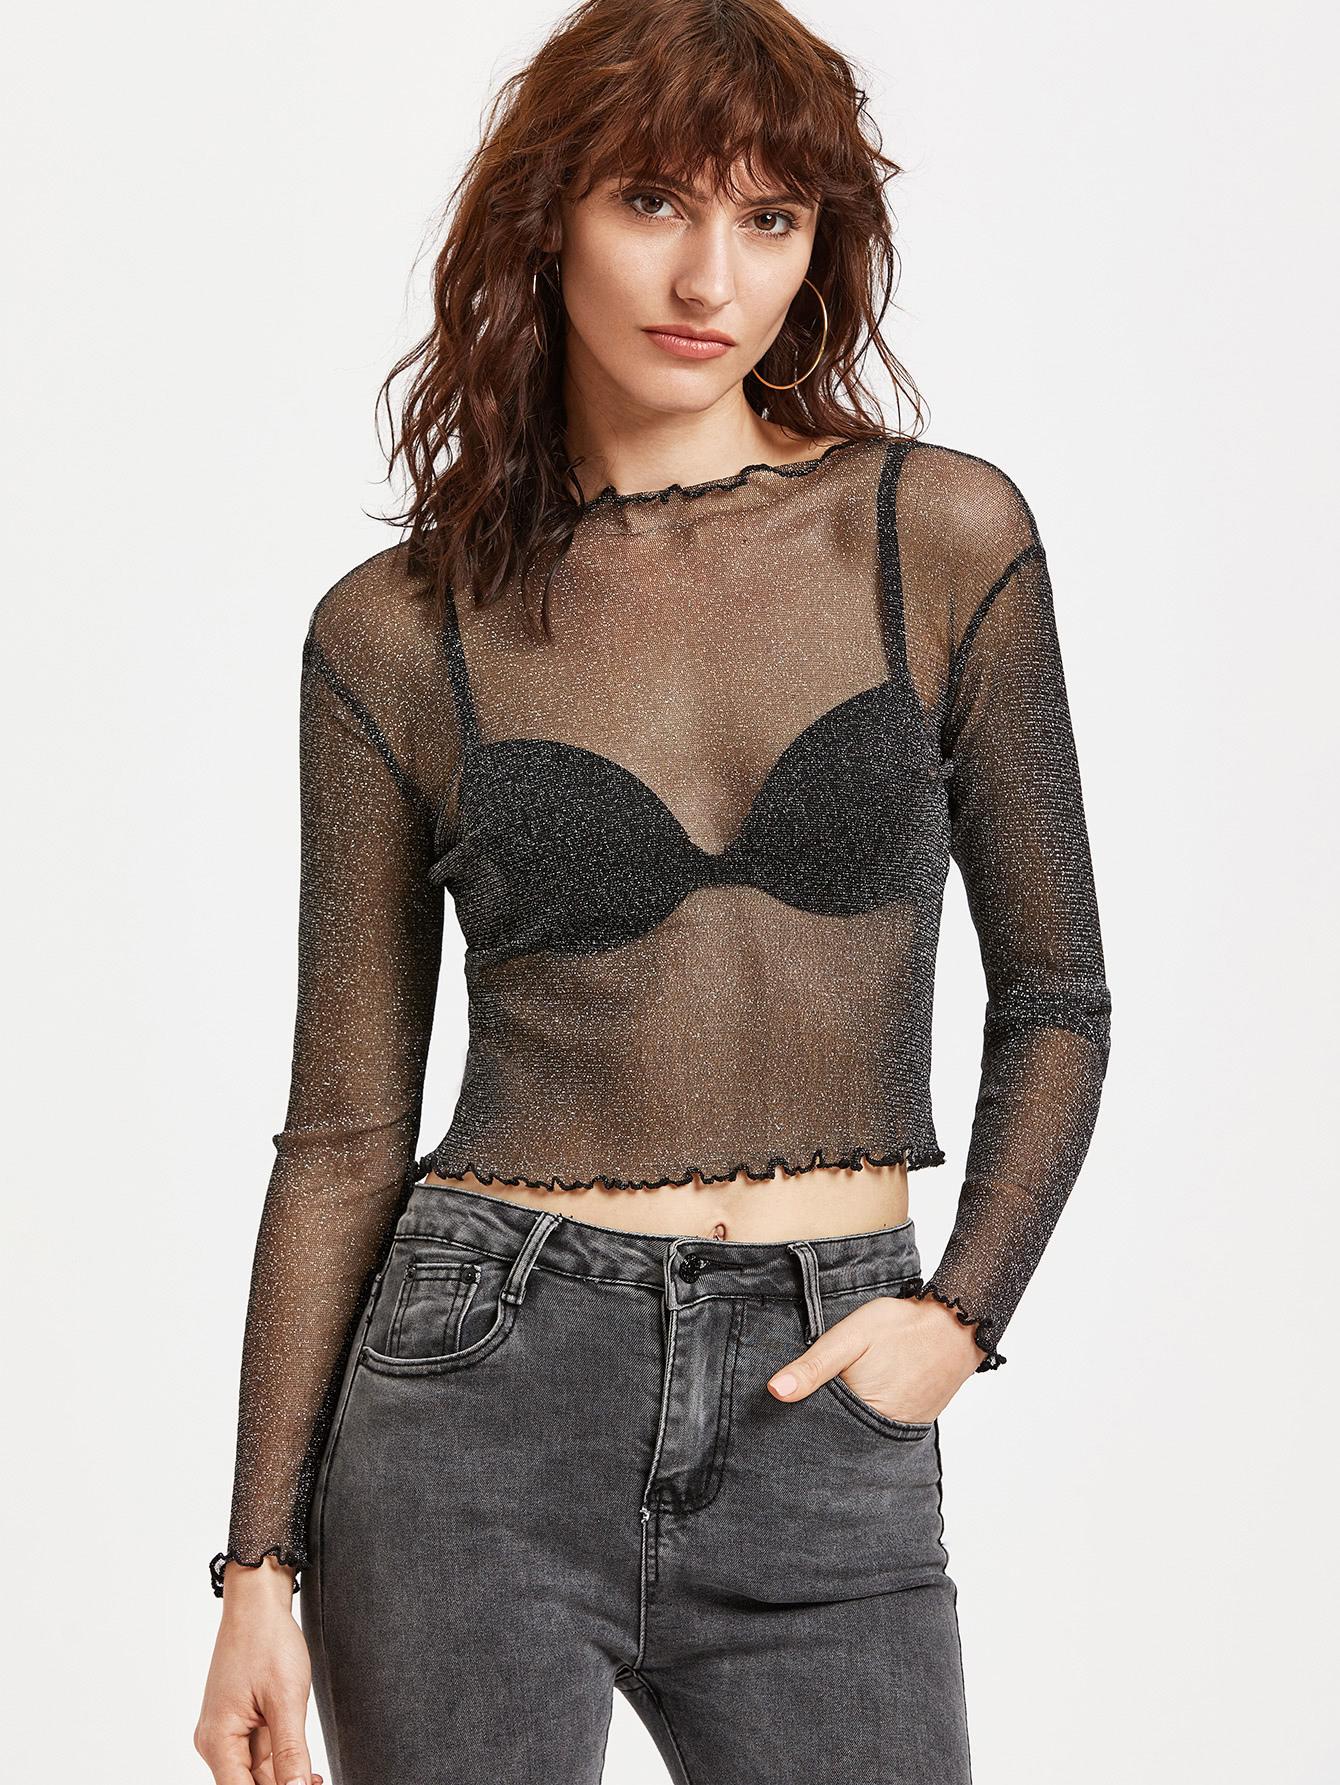 Black Sparkle Sheer Mesh Ruffle Top blouse170306301